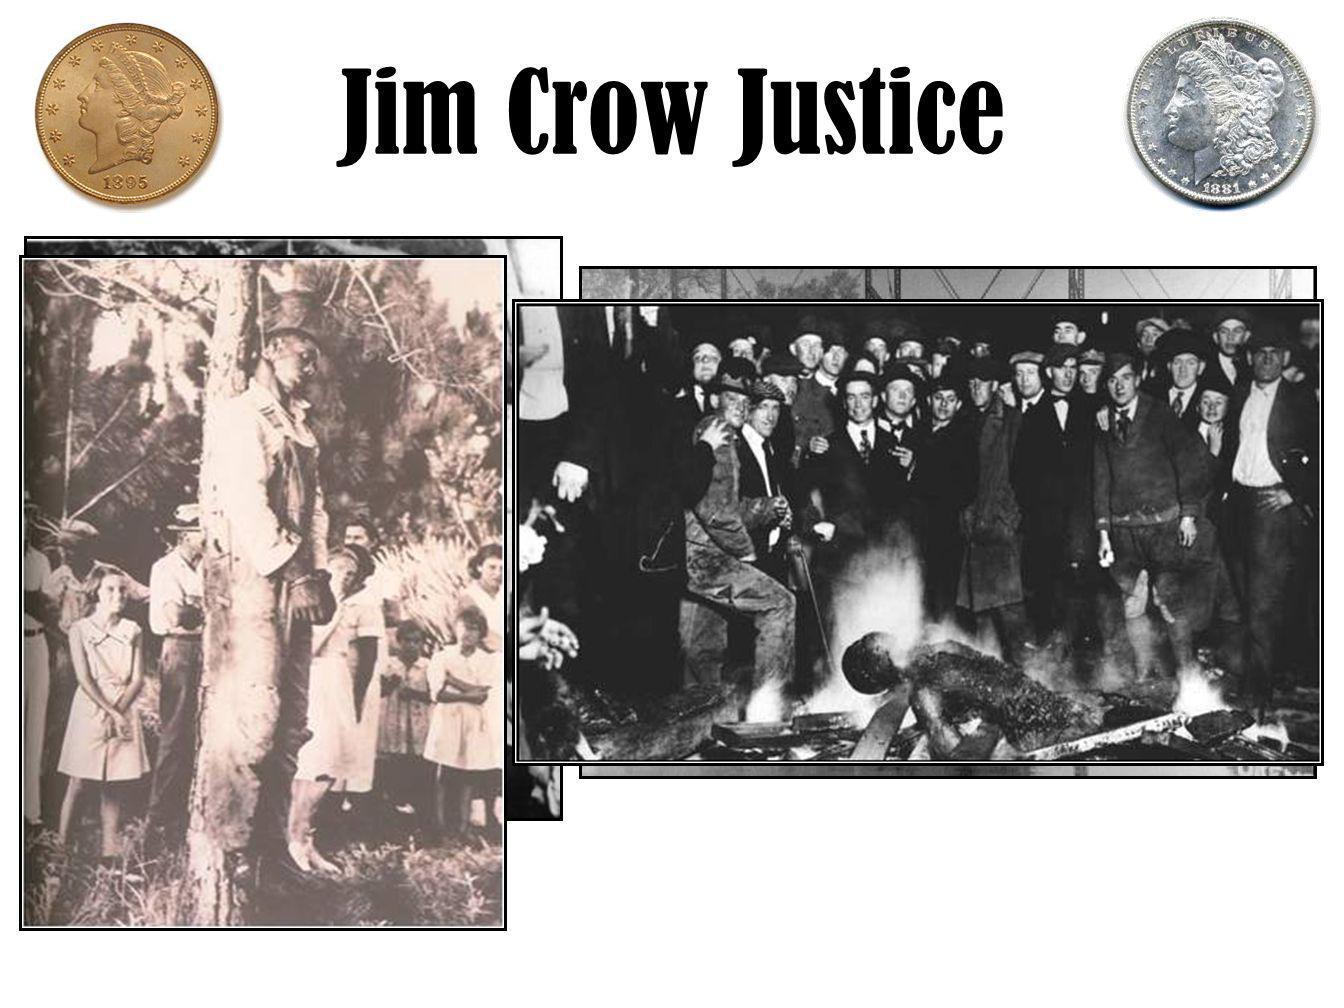 Jim Crow Justice